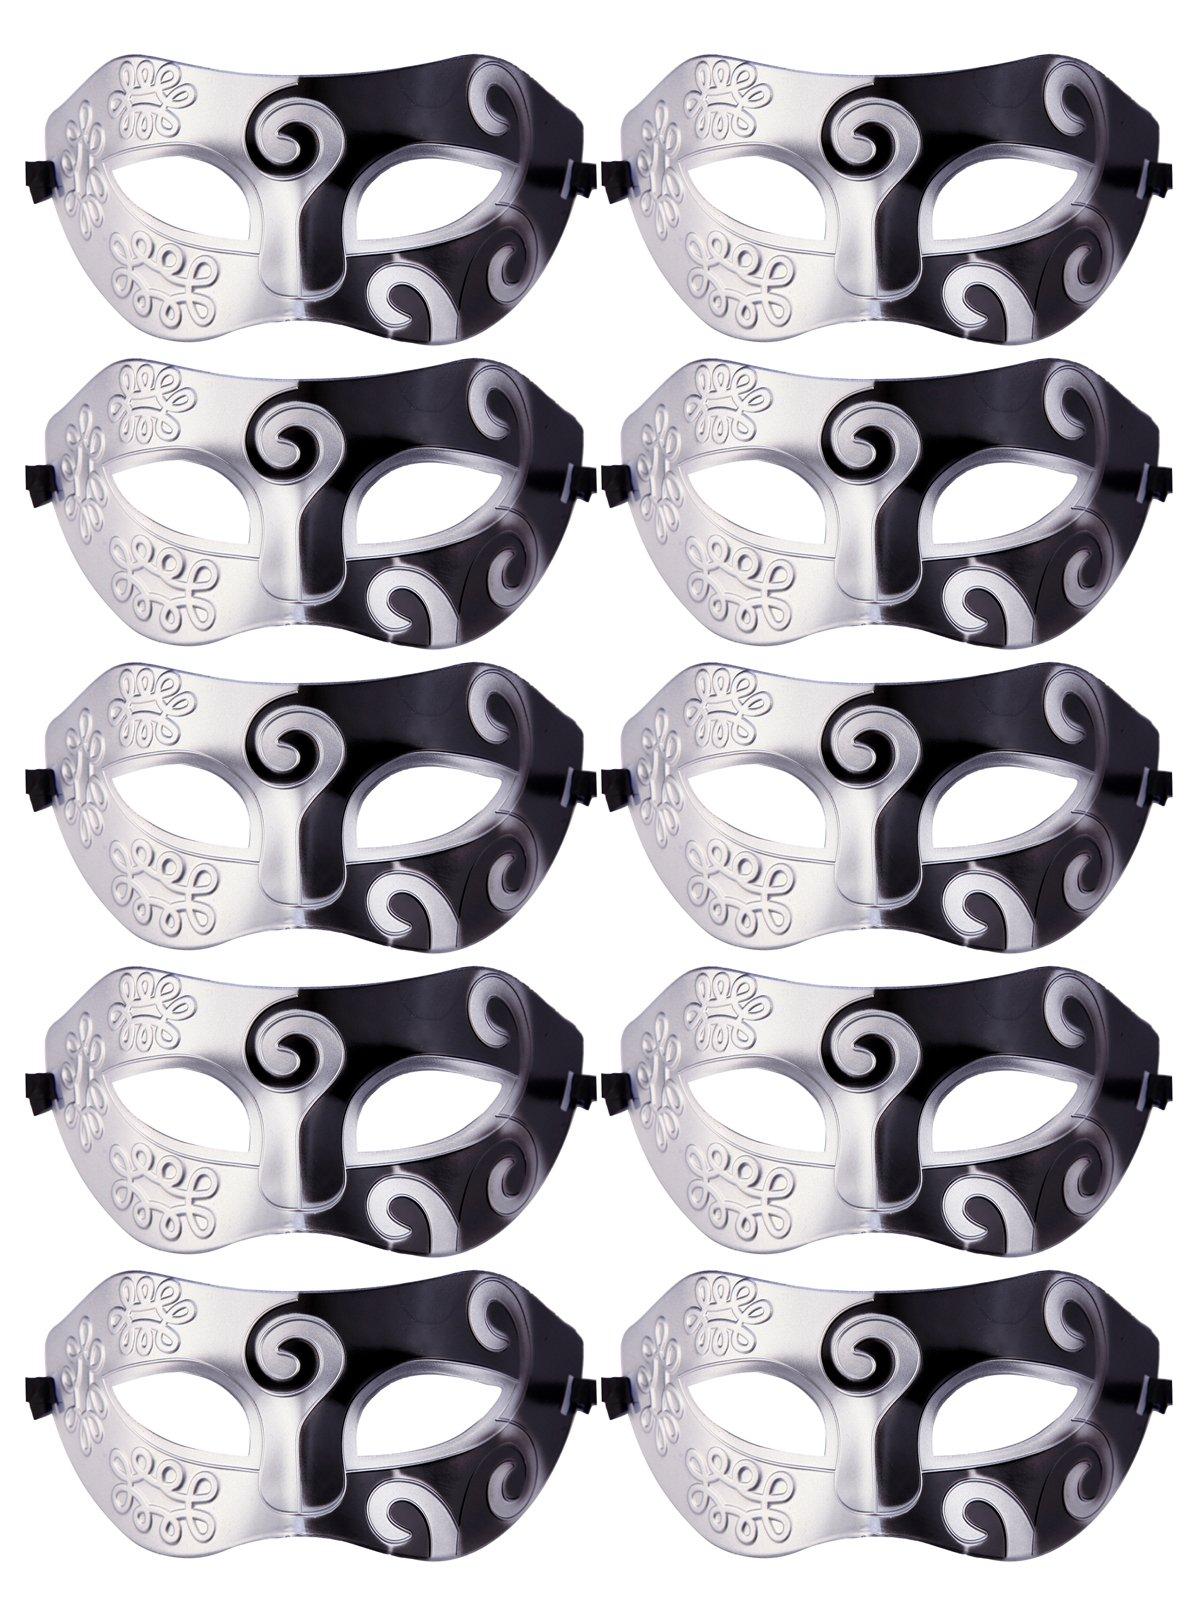 CISMARK Unisex Retro Masquerade Mask Mardi Gras Costume Party Acccessory